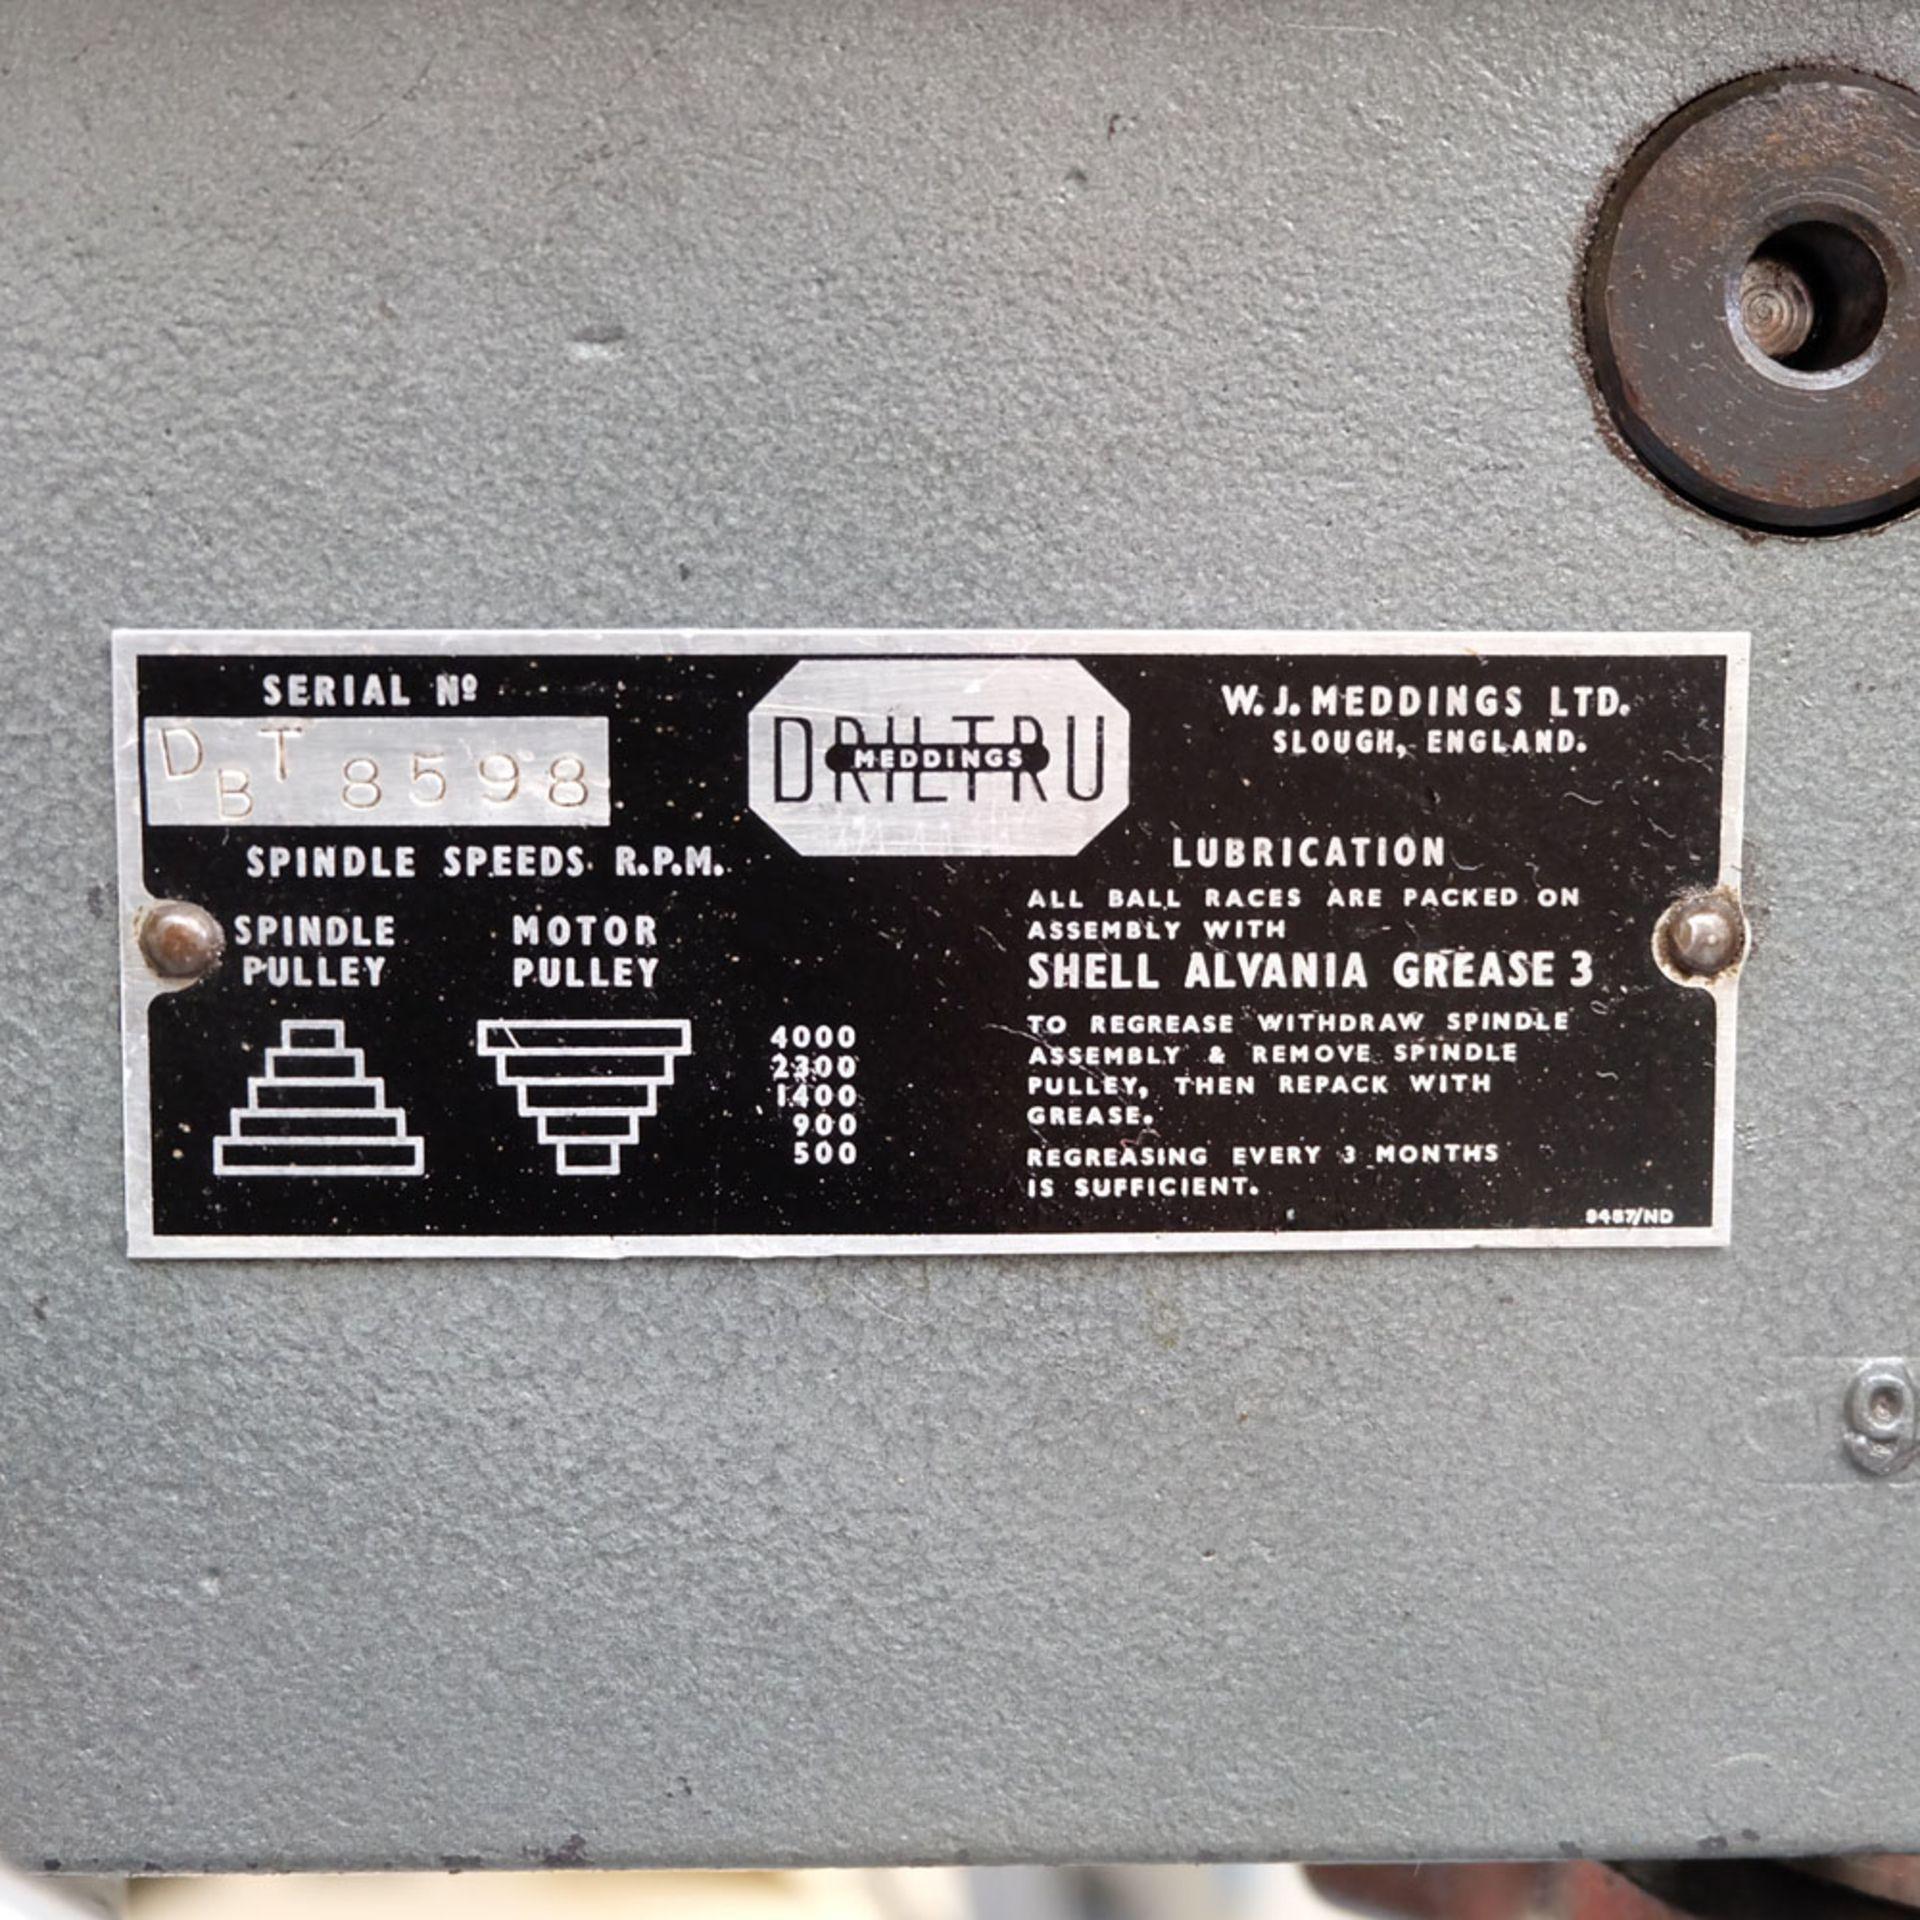 "Meddings Type Driltru Pillar Drill. Capacity 1/2"". 5 Speeds 500 - 4000rpm. - Image 4 of 7"